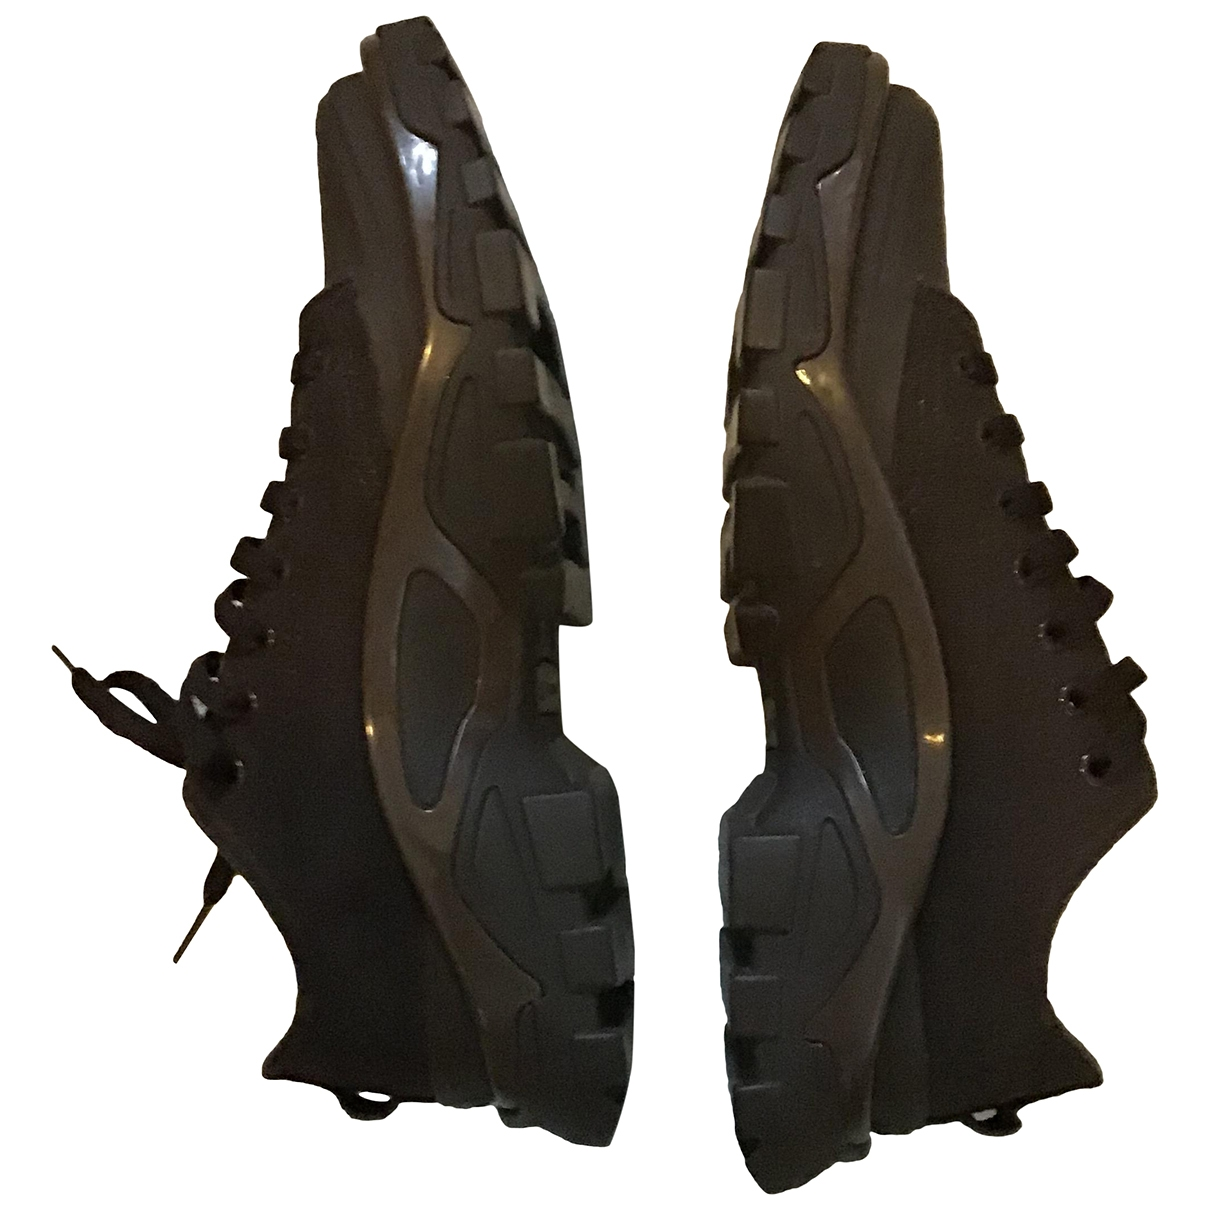 Adidas X Raf Simons \N Brown Cloth Trainers for Men 9 US